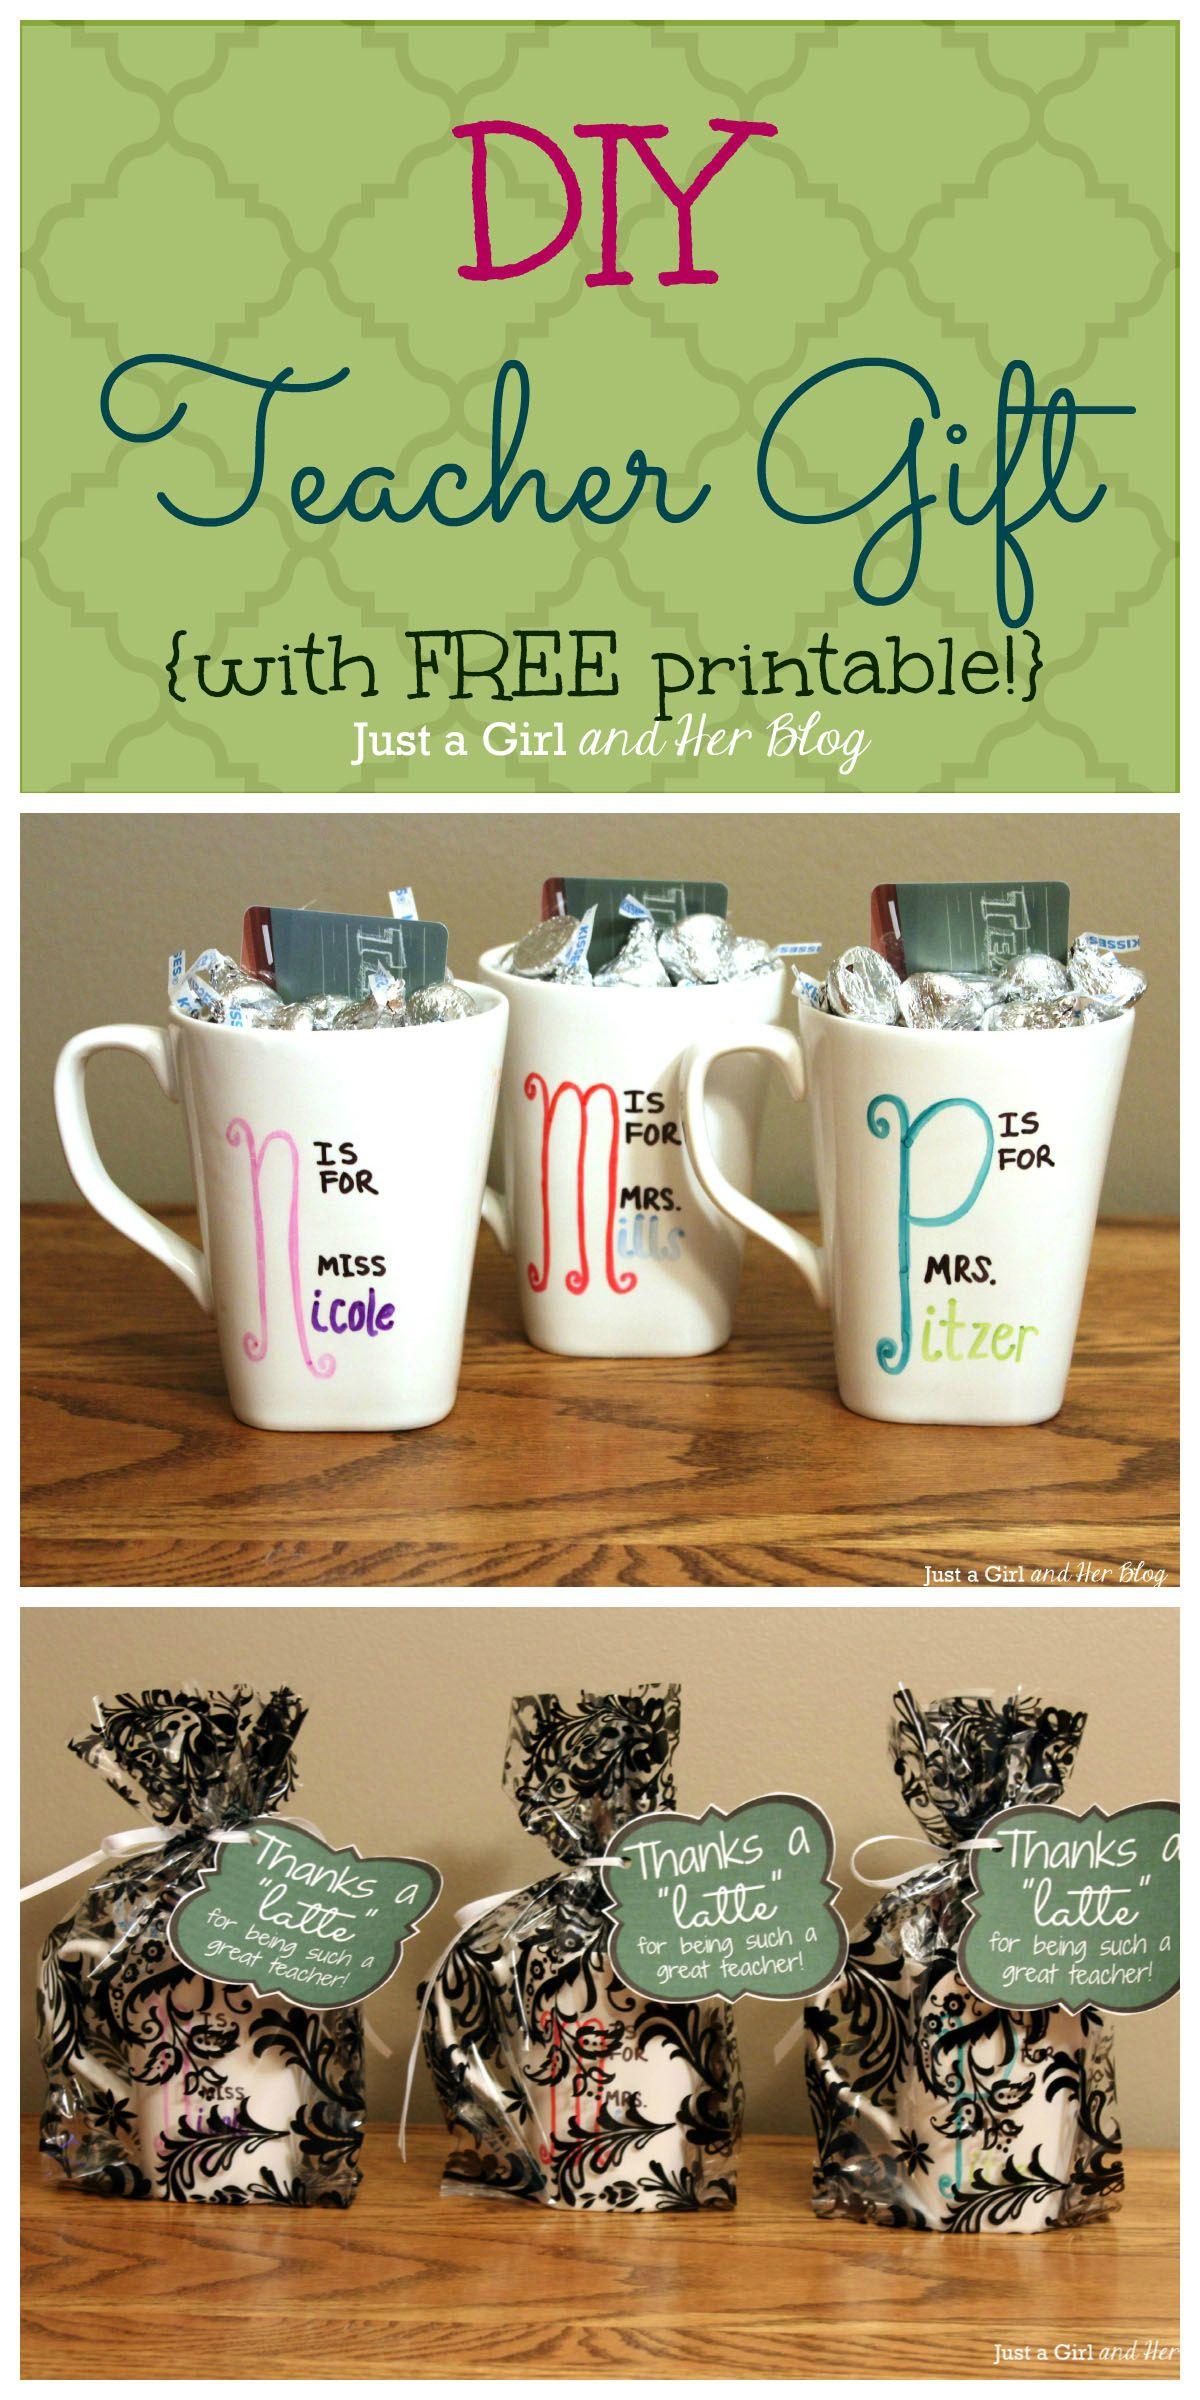 Last Minute Mama Diy Teacher Gift With Free Printable